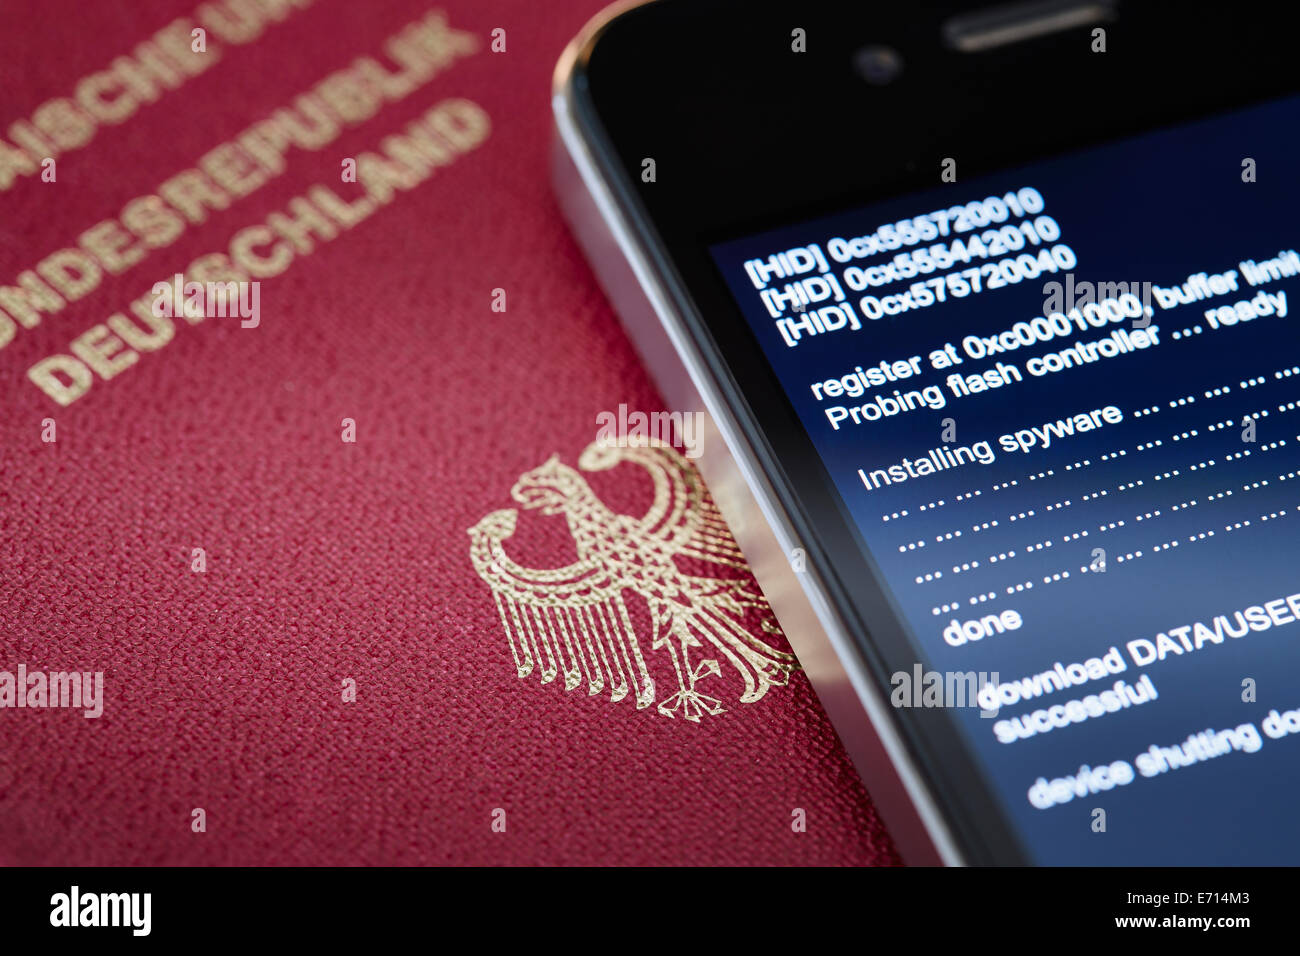 Smartphone alemán intervenidas por spyware Imagen De Stock